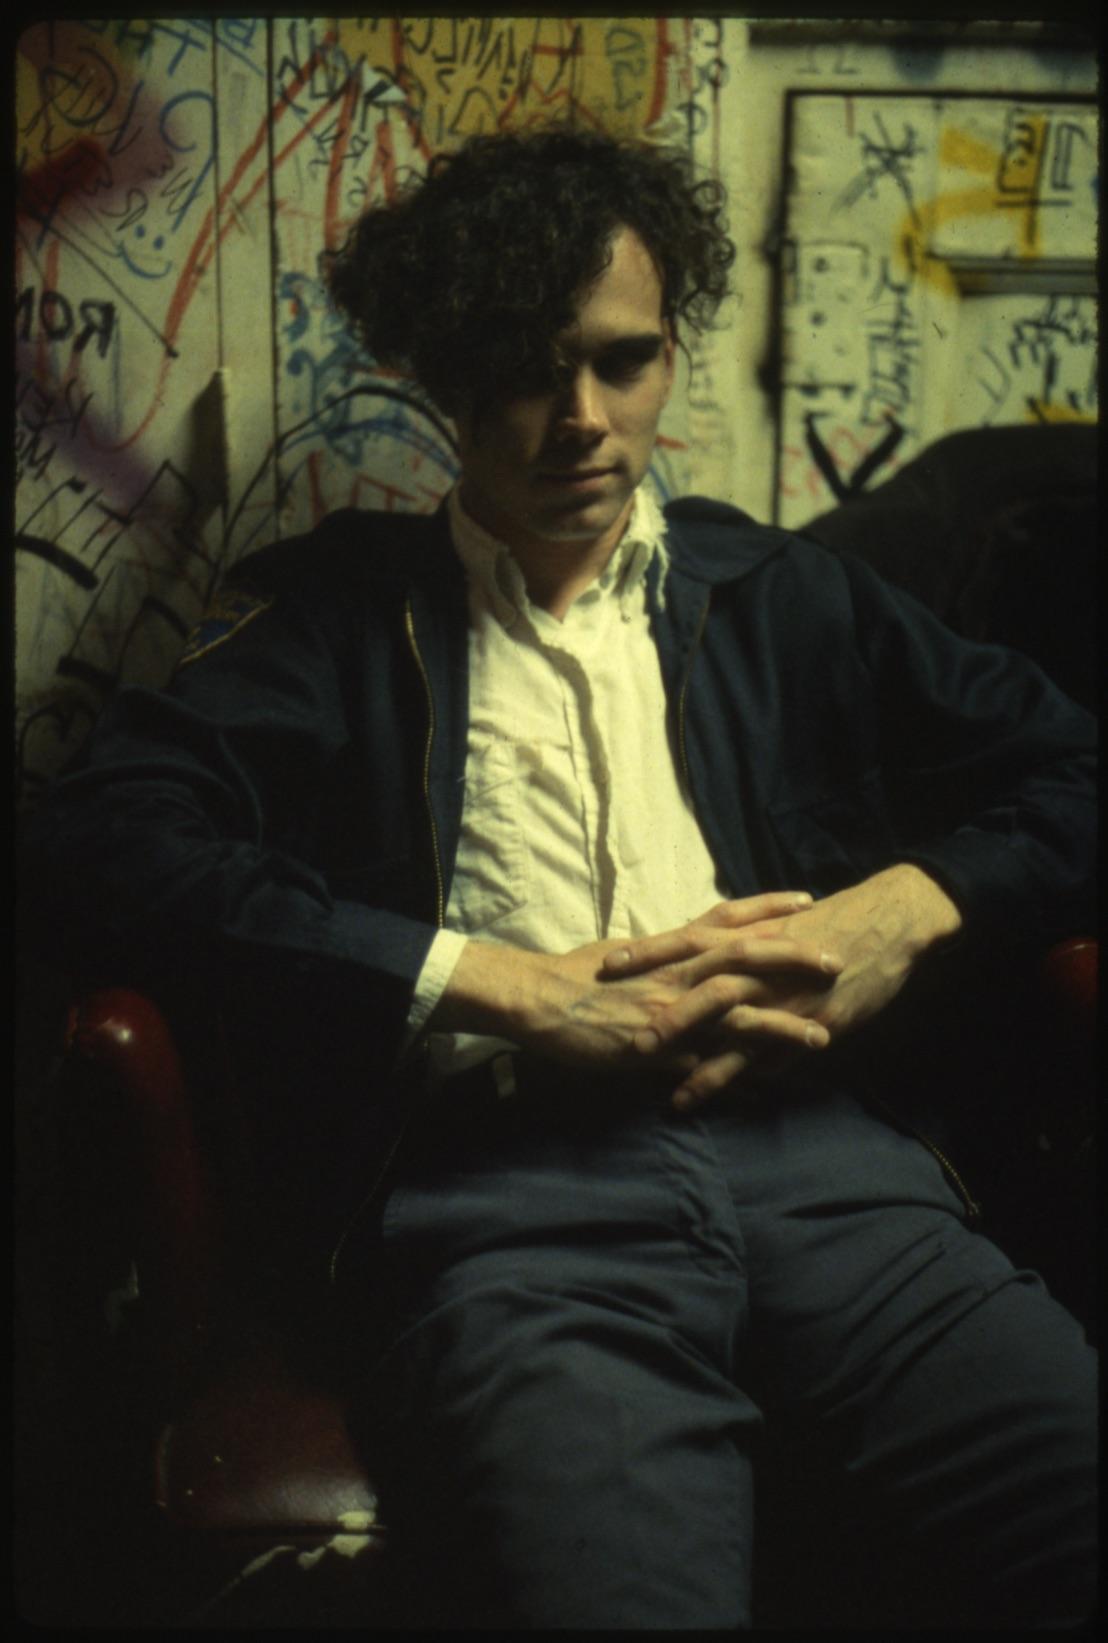 Ed Smith, circa 1984. Photo by Sheree Rose.